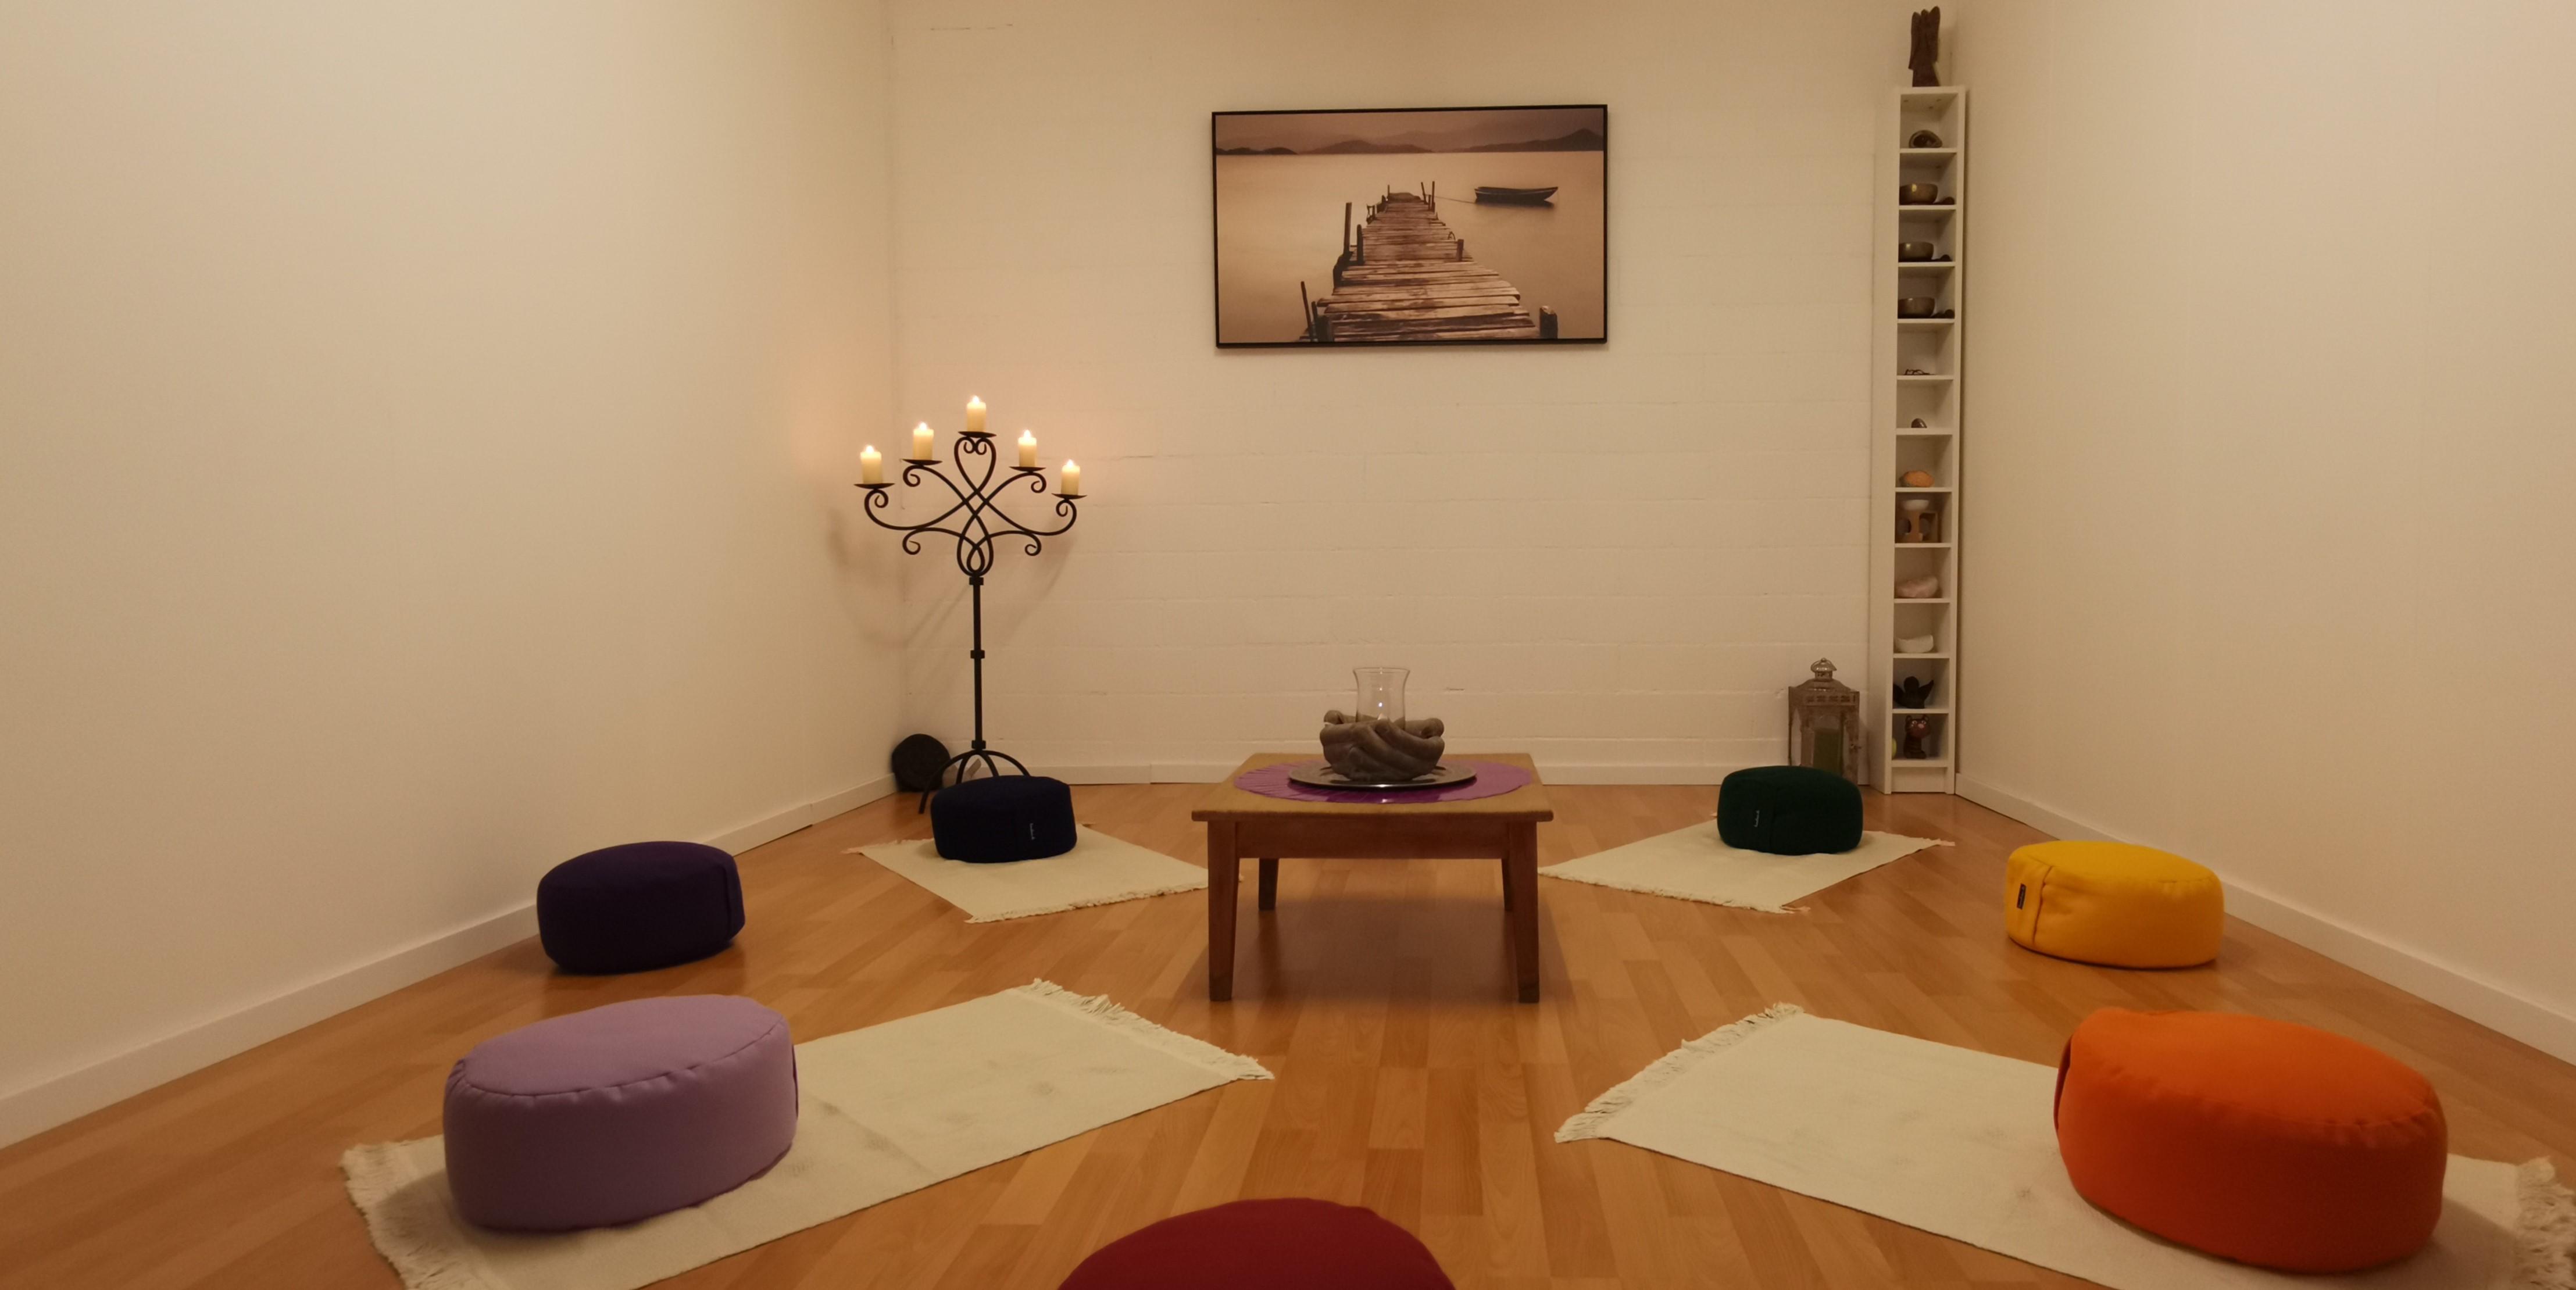 3_Meditation, Phantasiereisen